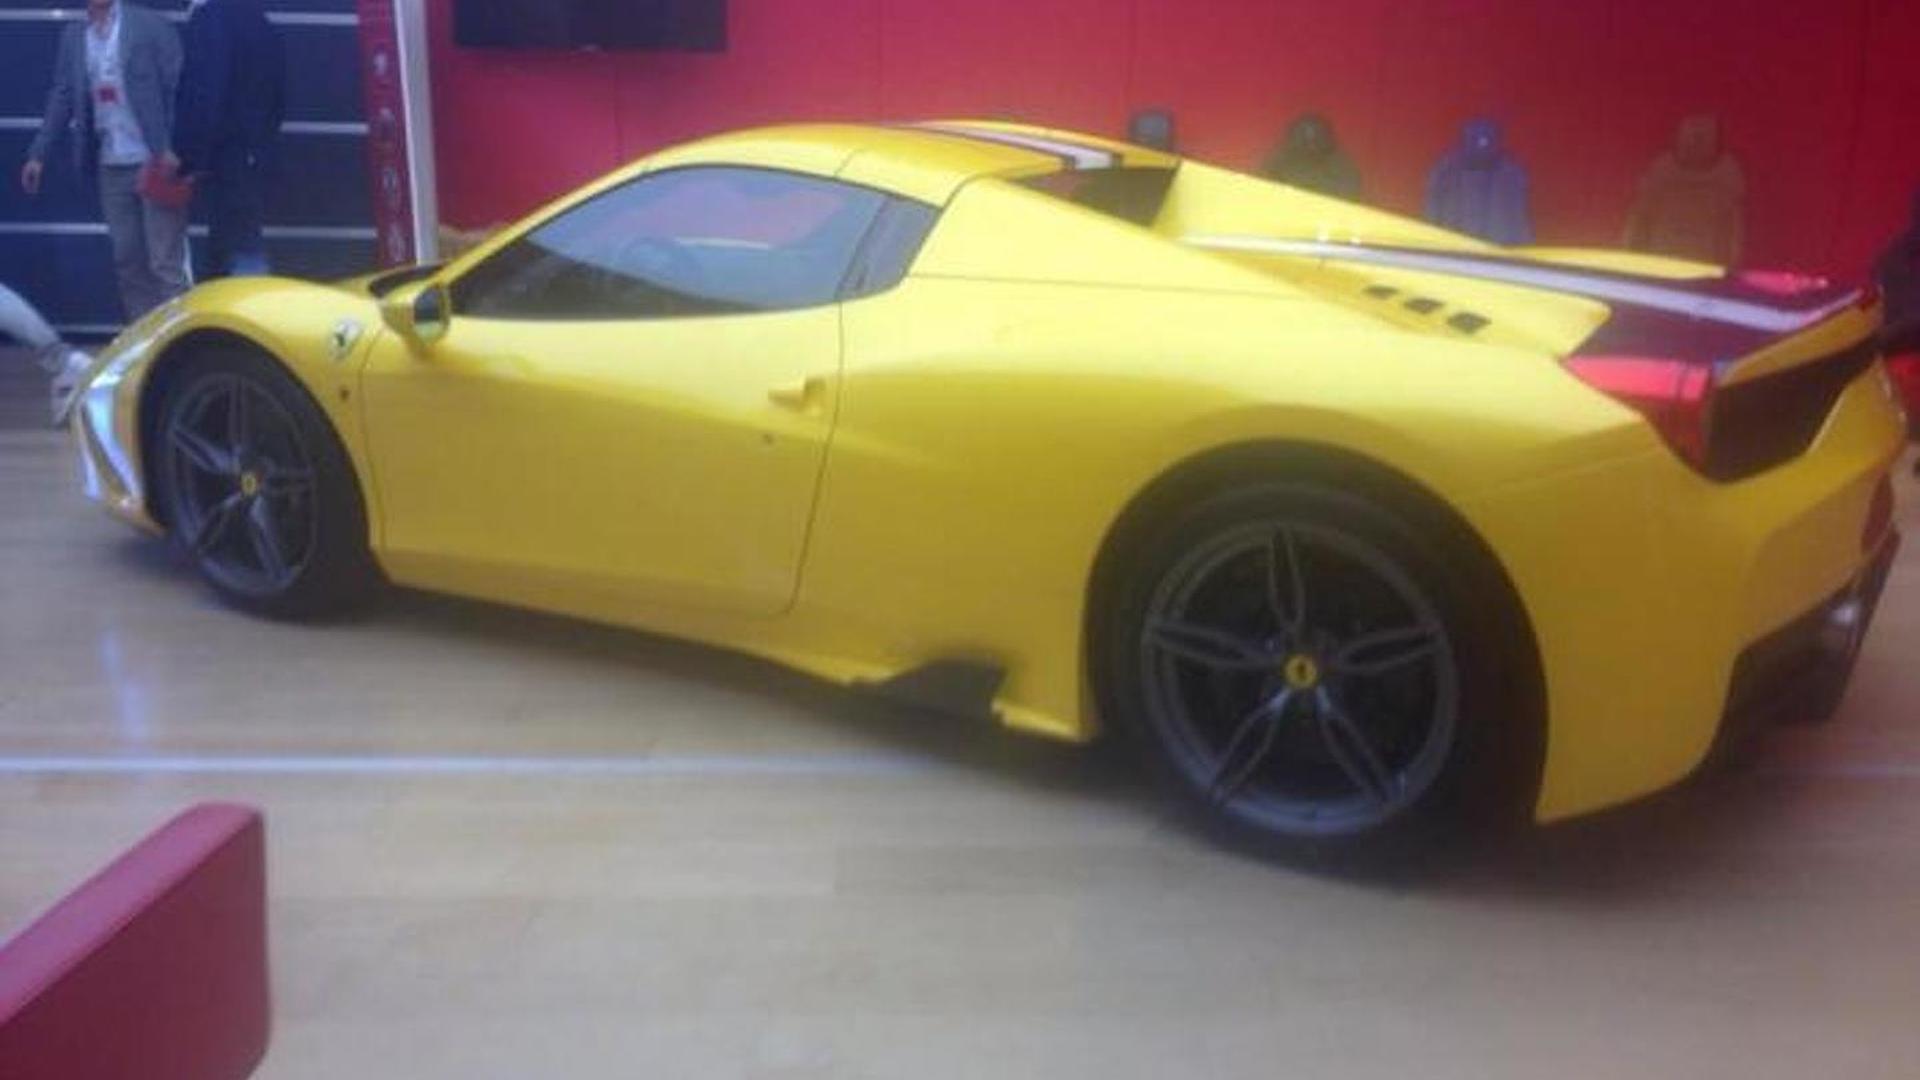 Ferrari 458 Speciale Spider photographed undisguised in Maranello